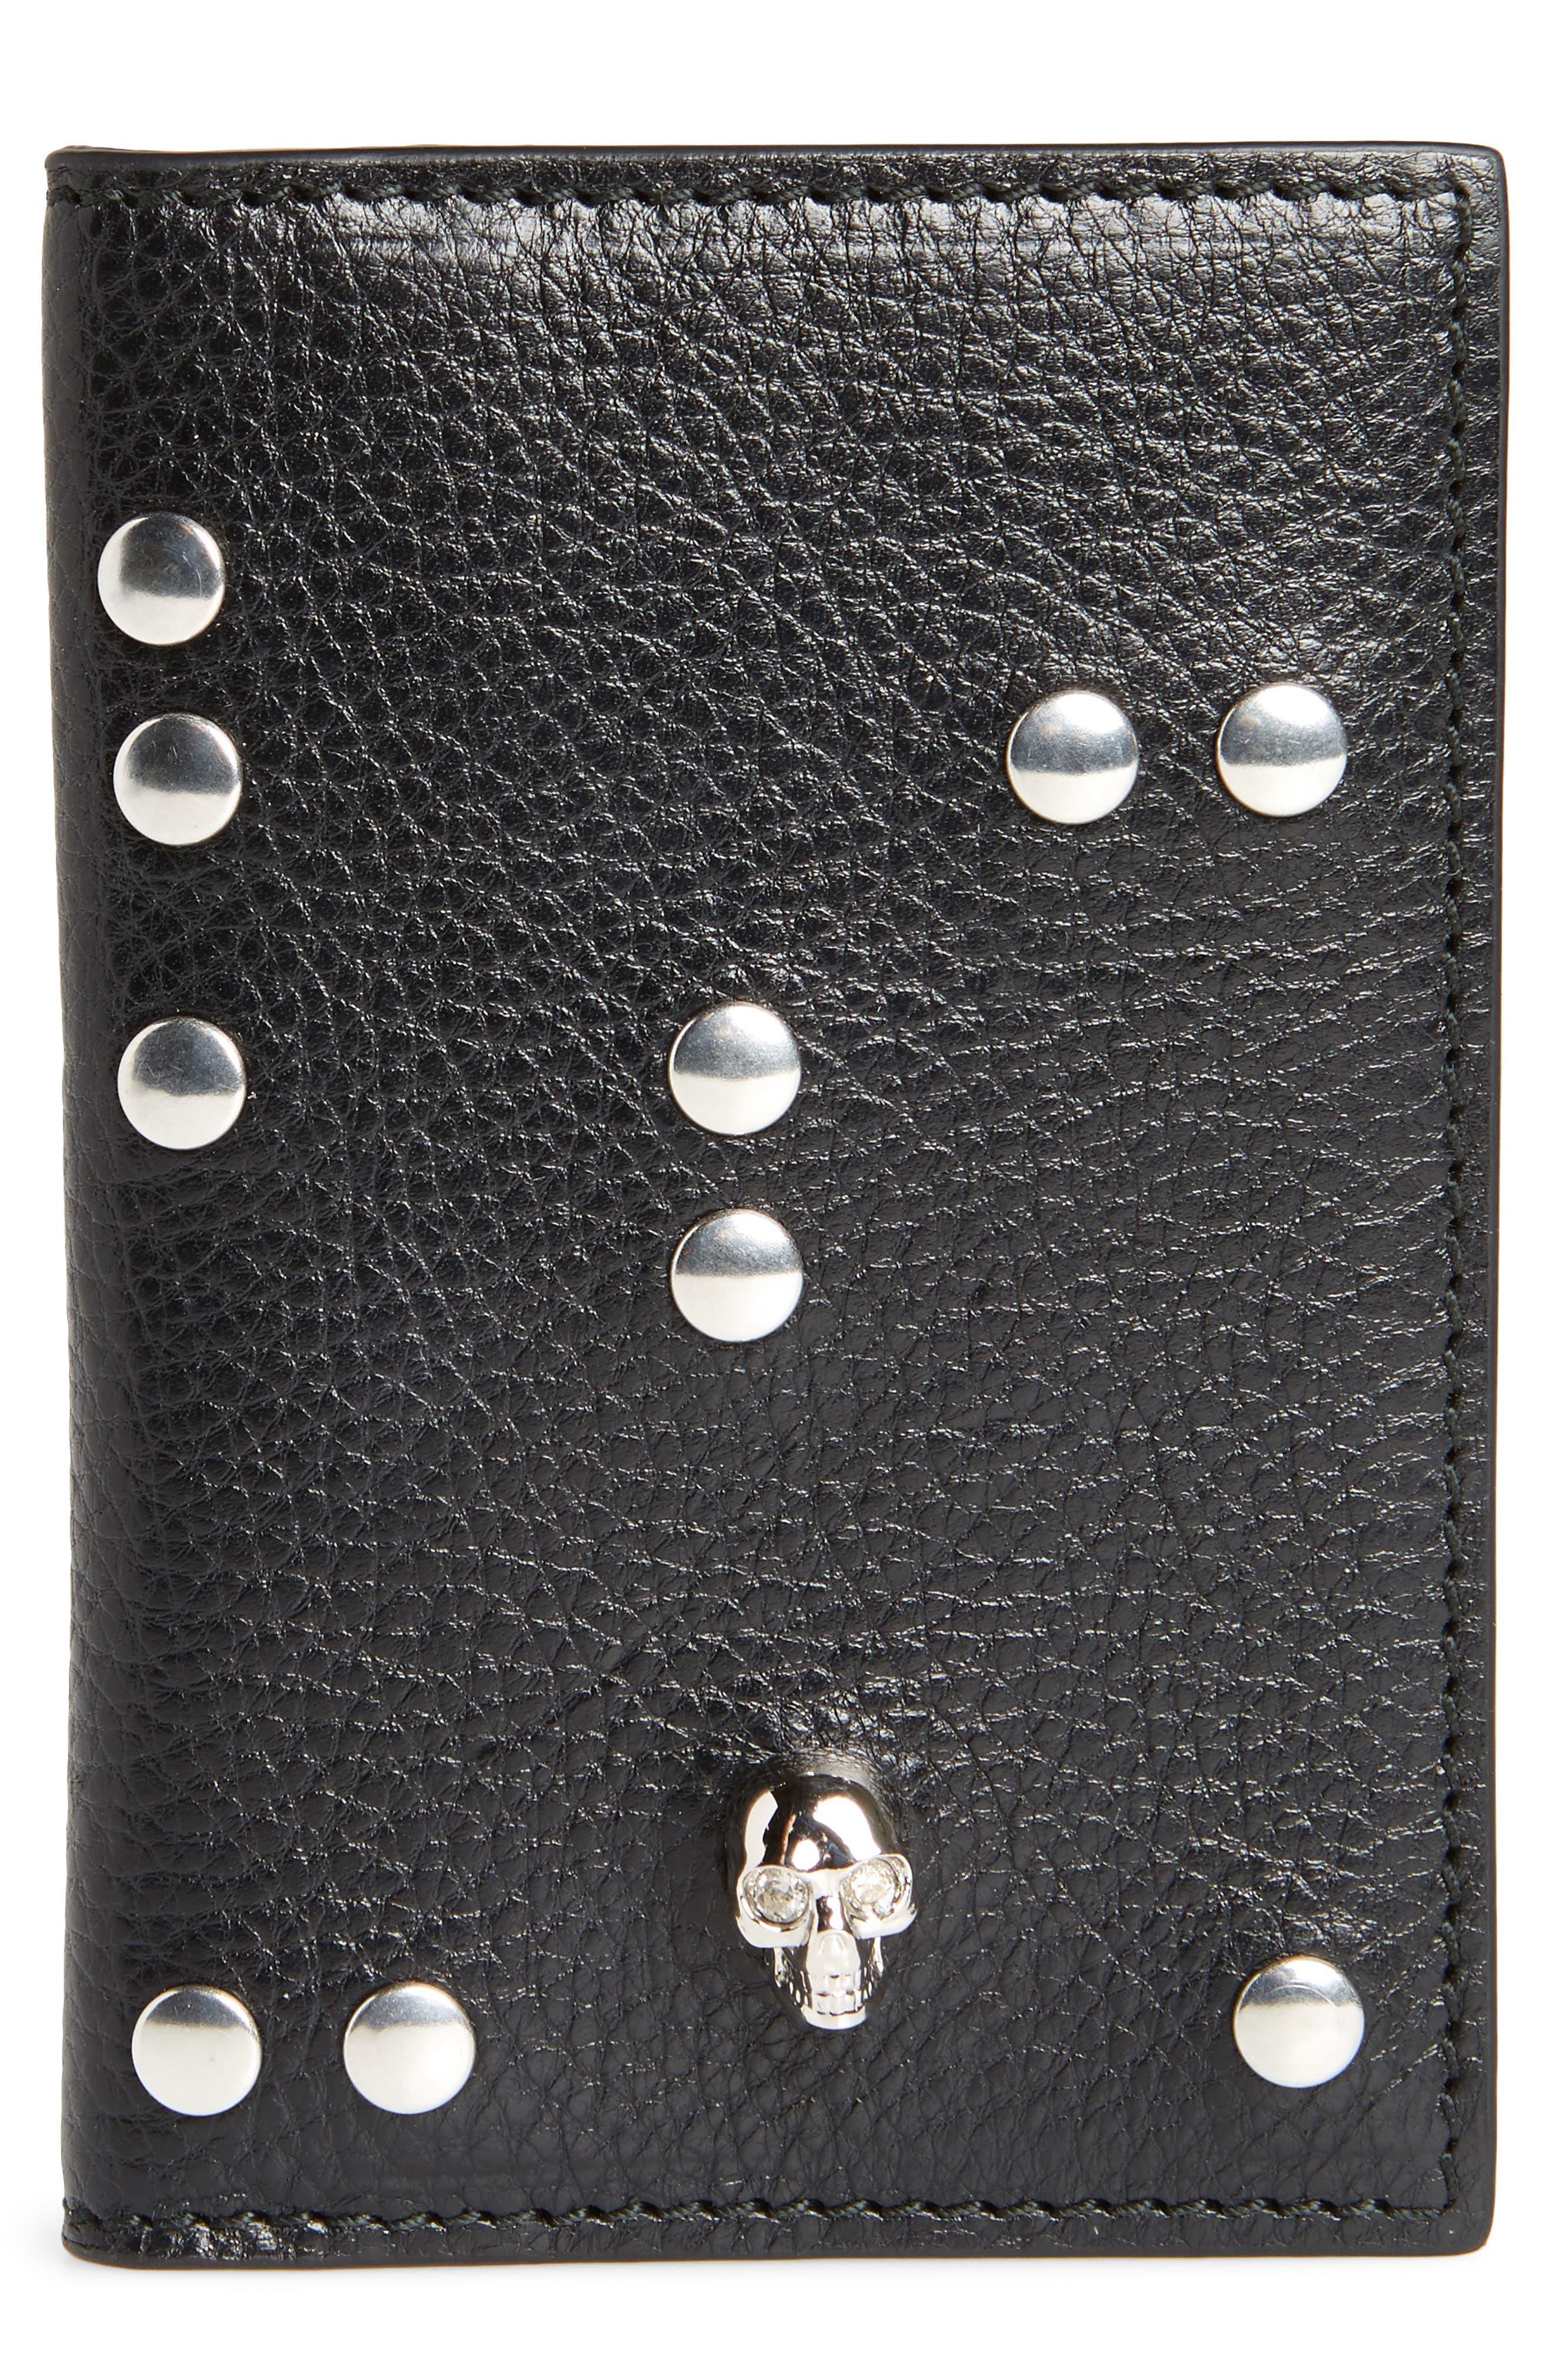 Alternate Image 1 Selected - Alexander McQueen Studded Leather Card Holder